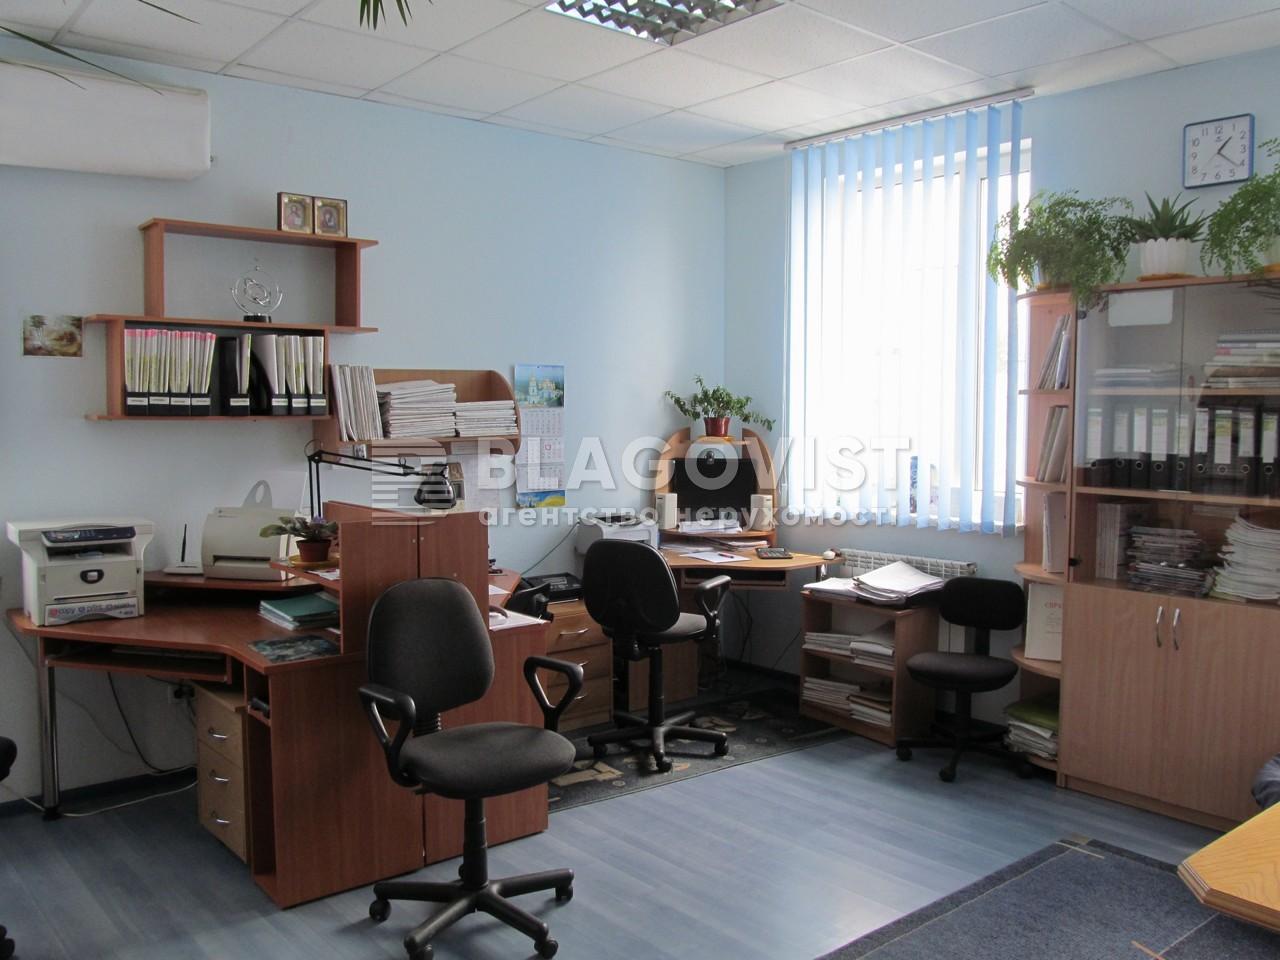 Офисно-складское помещение, F-33728, Скляренко Семена, Киев - Фото 8